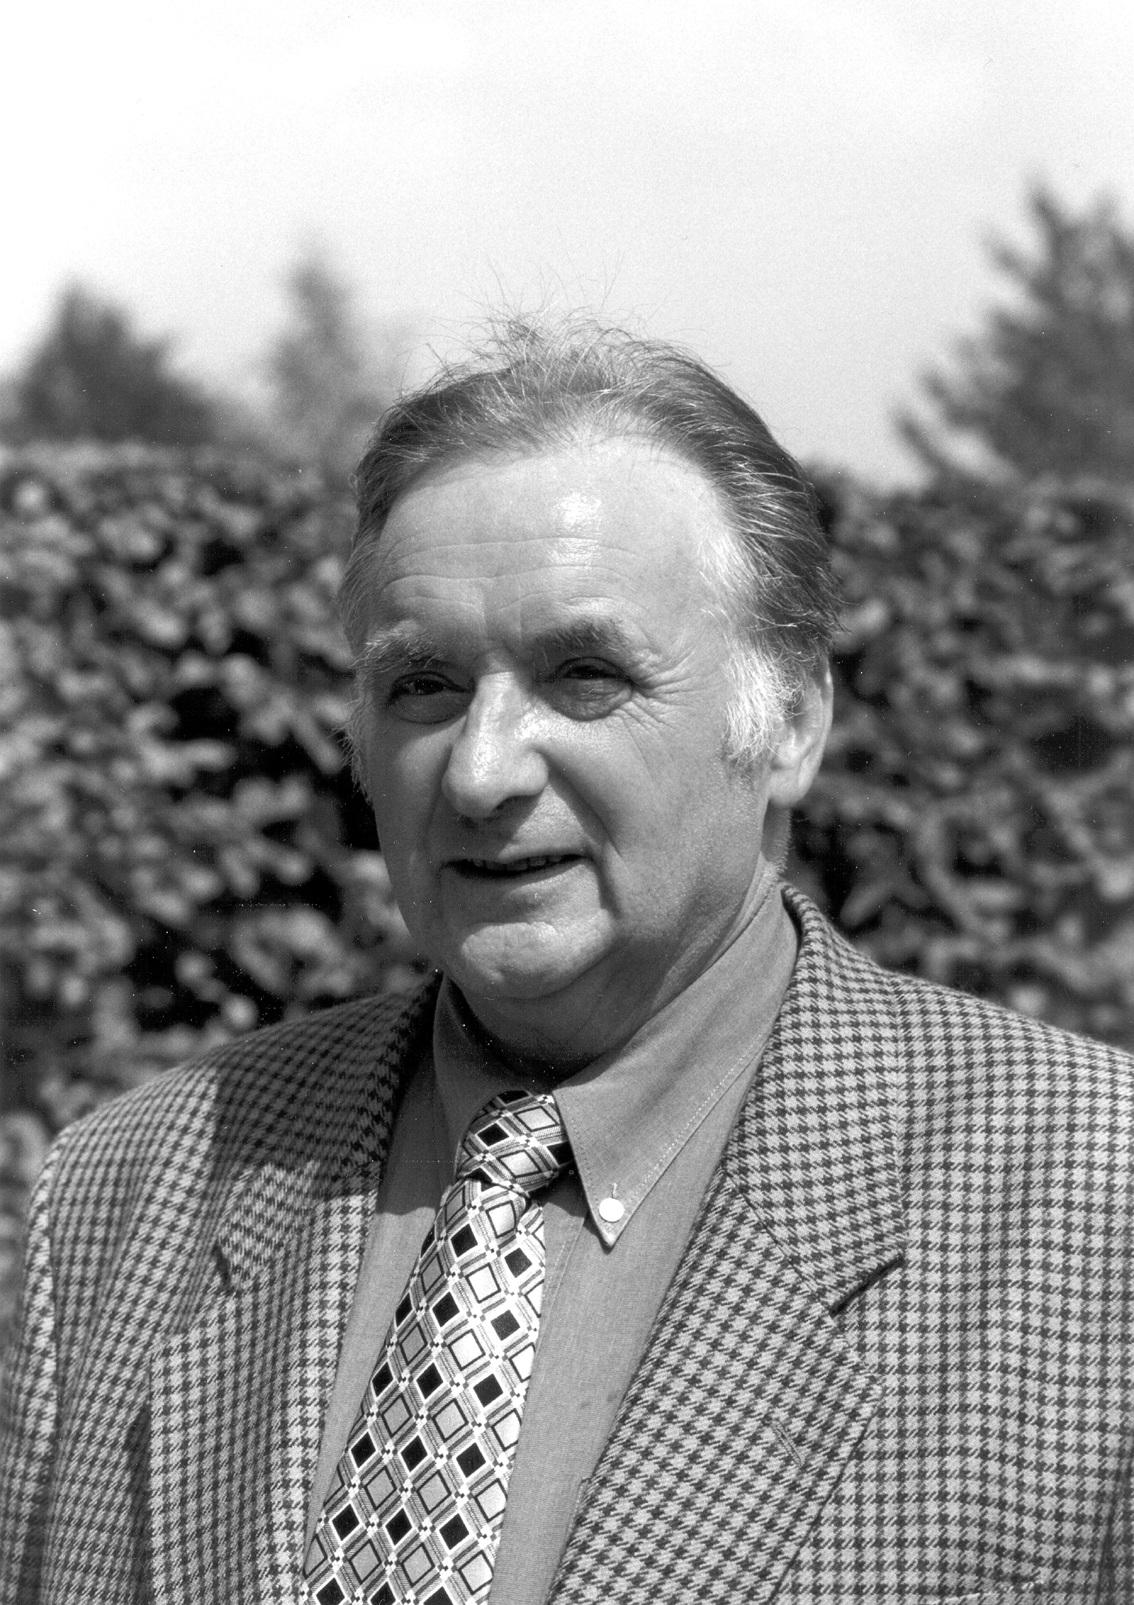 Johannes Zumdick